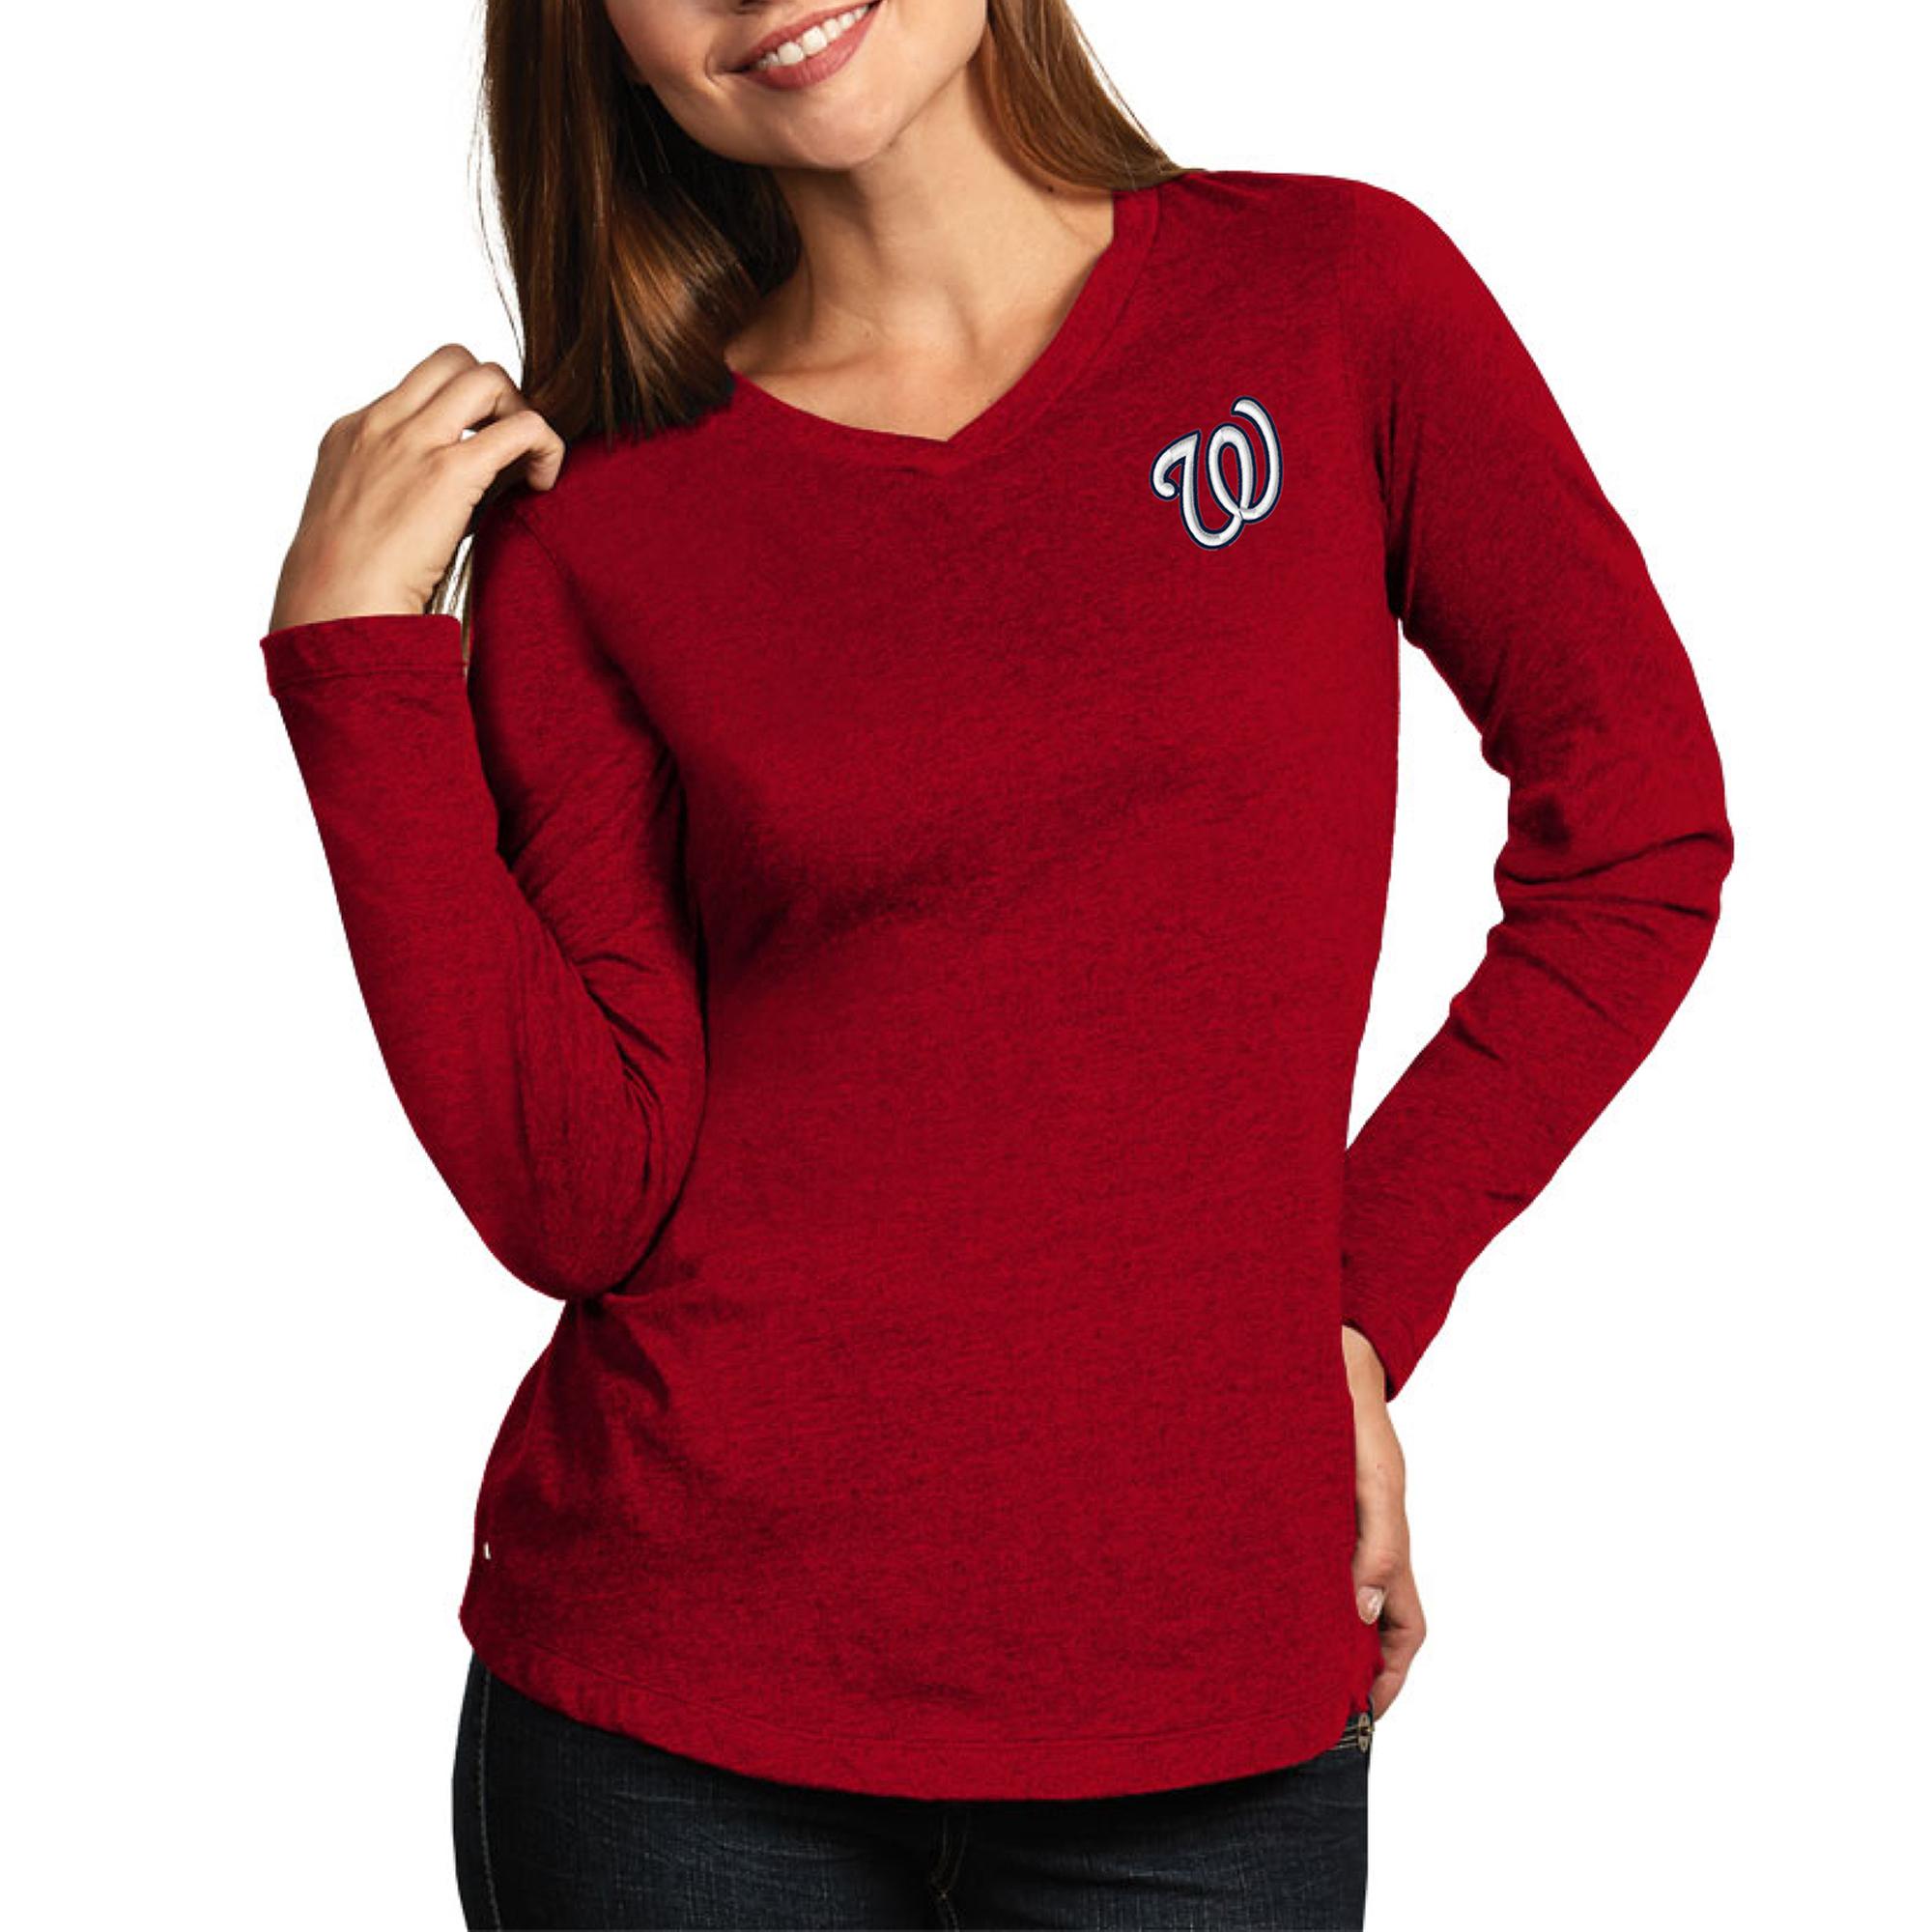 Washington Nationals Antigua Women's Flip Long Sleeve T-Shirt - Heather Red